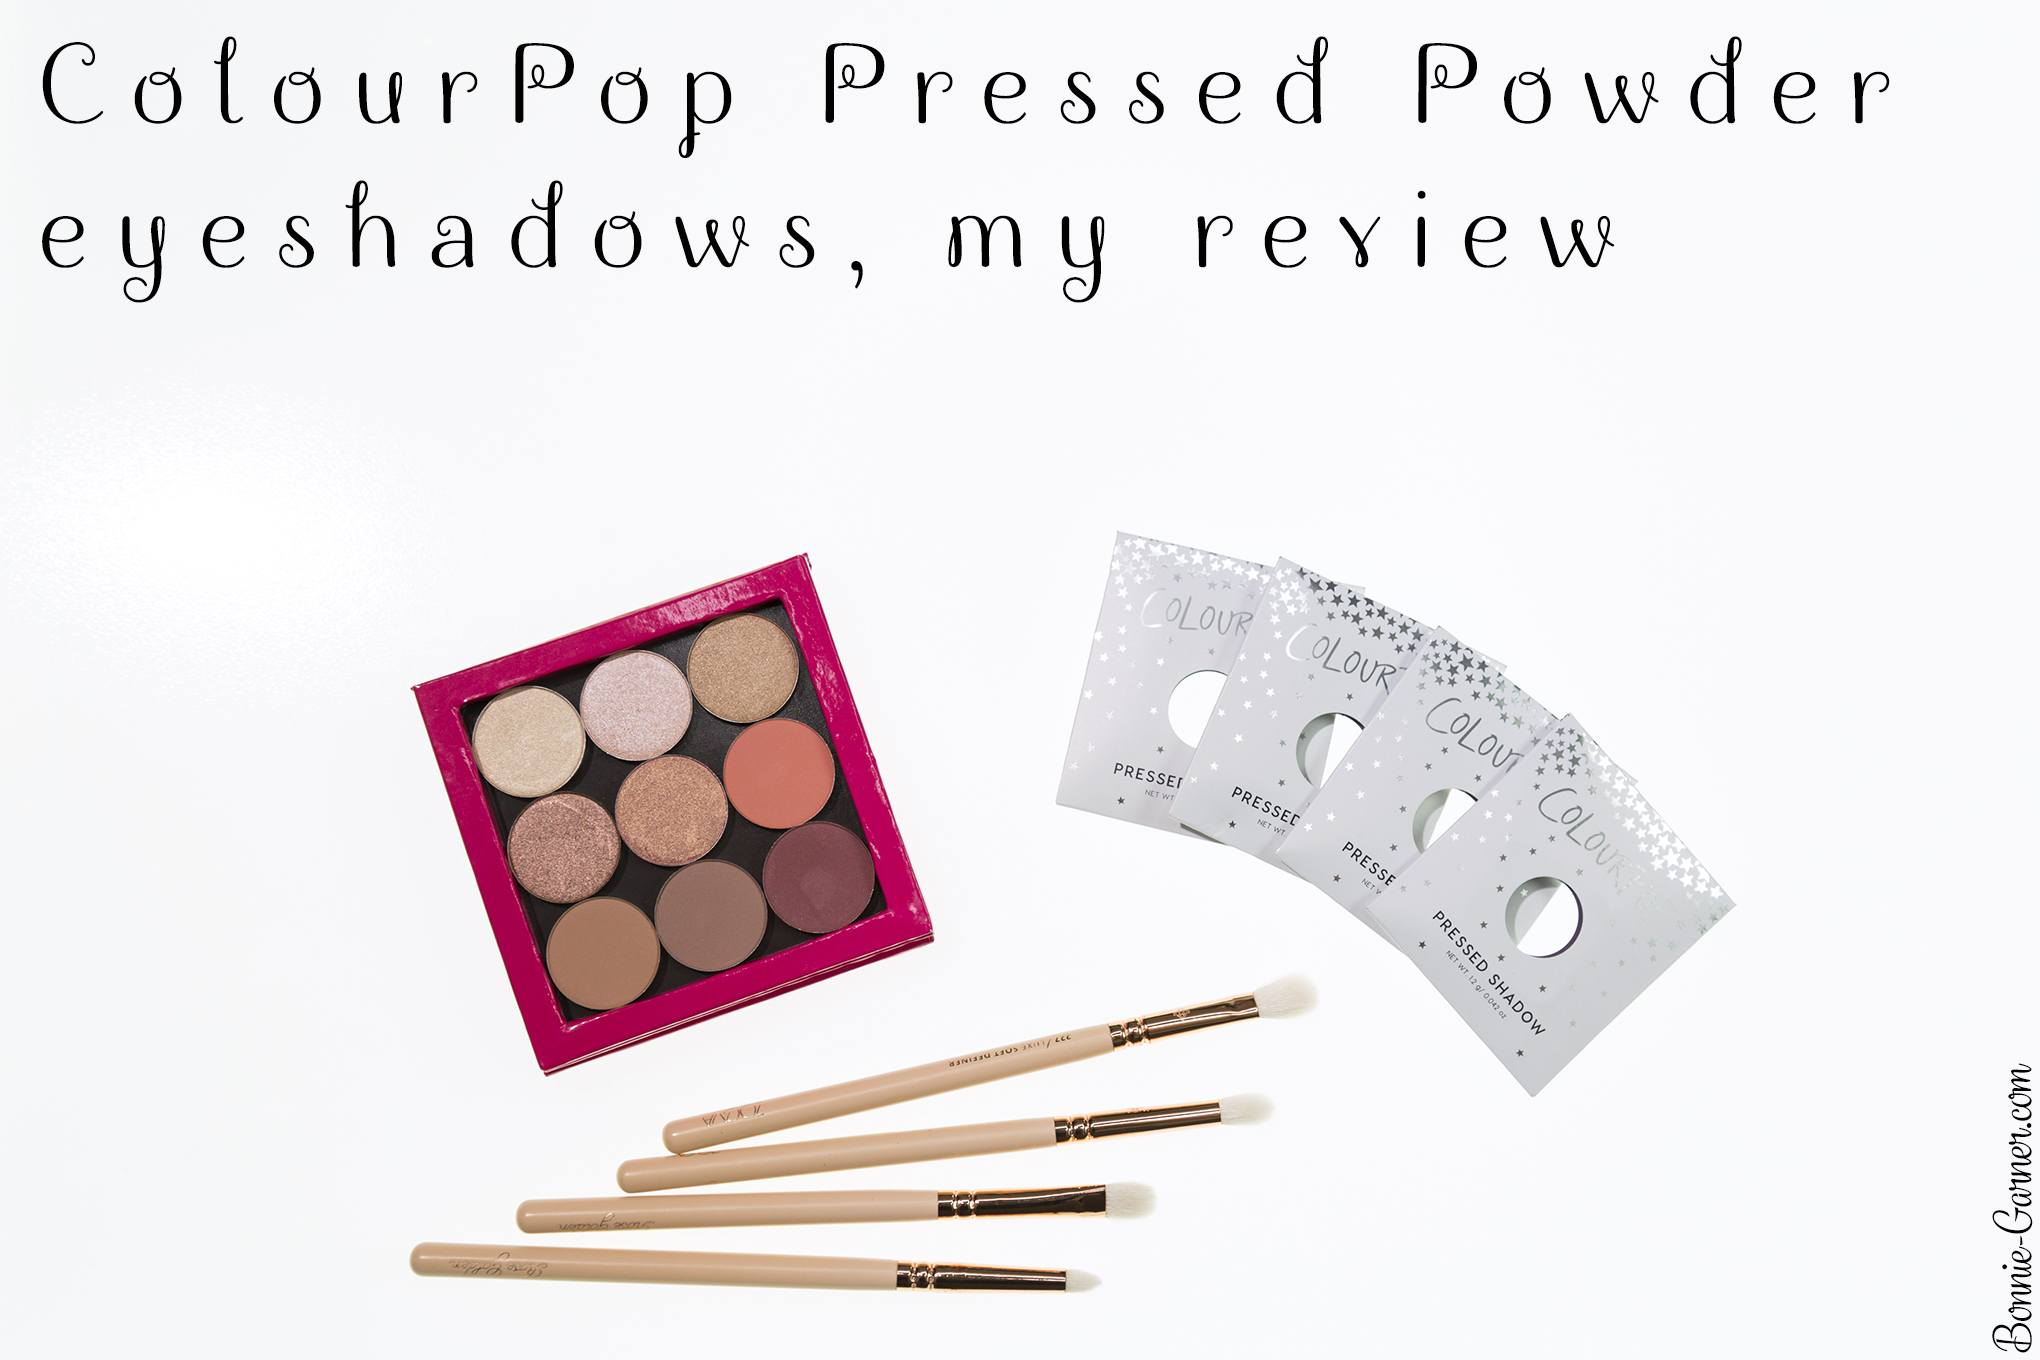 ColourPop Pressed Powder eyeshadows, my review